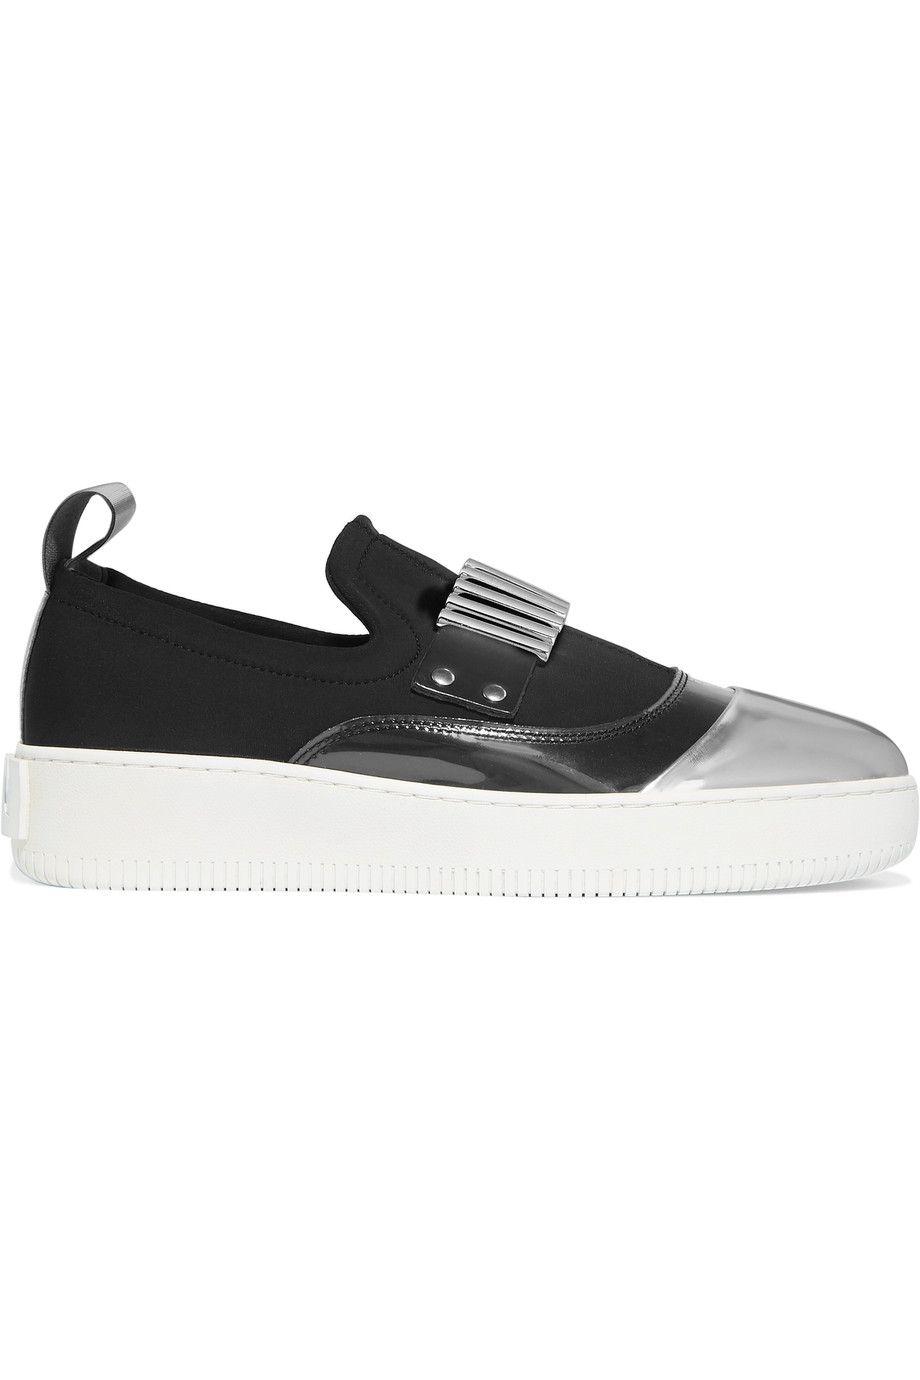 MCQ BY ALEXANDER MCQUEEN PVC-paneled embellished neoprene slip on sneakers.  #mcqbyalexandermcqueen #